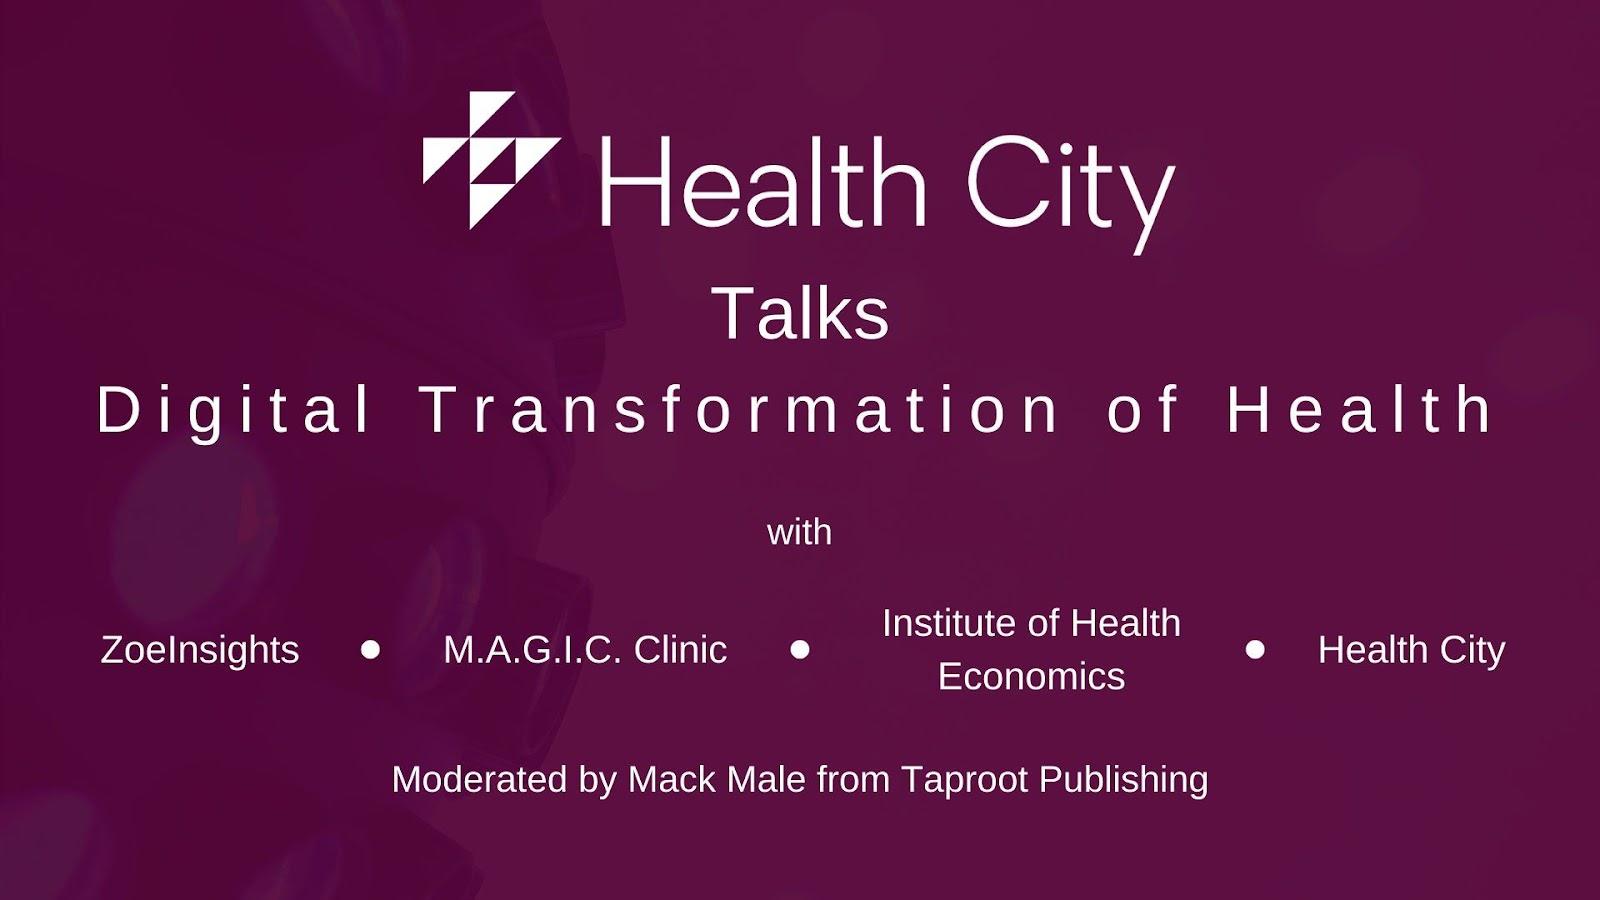 Health city talks